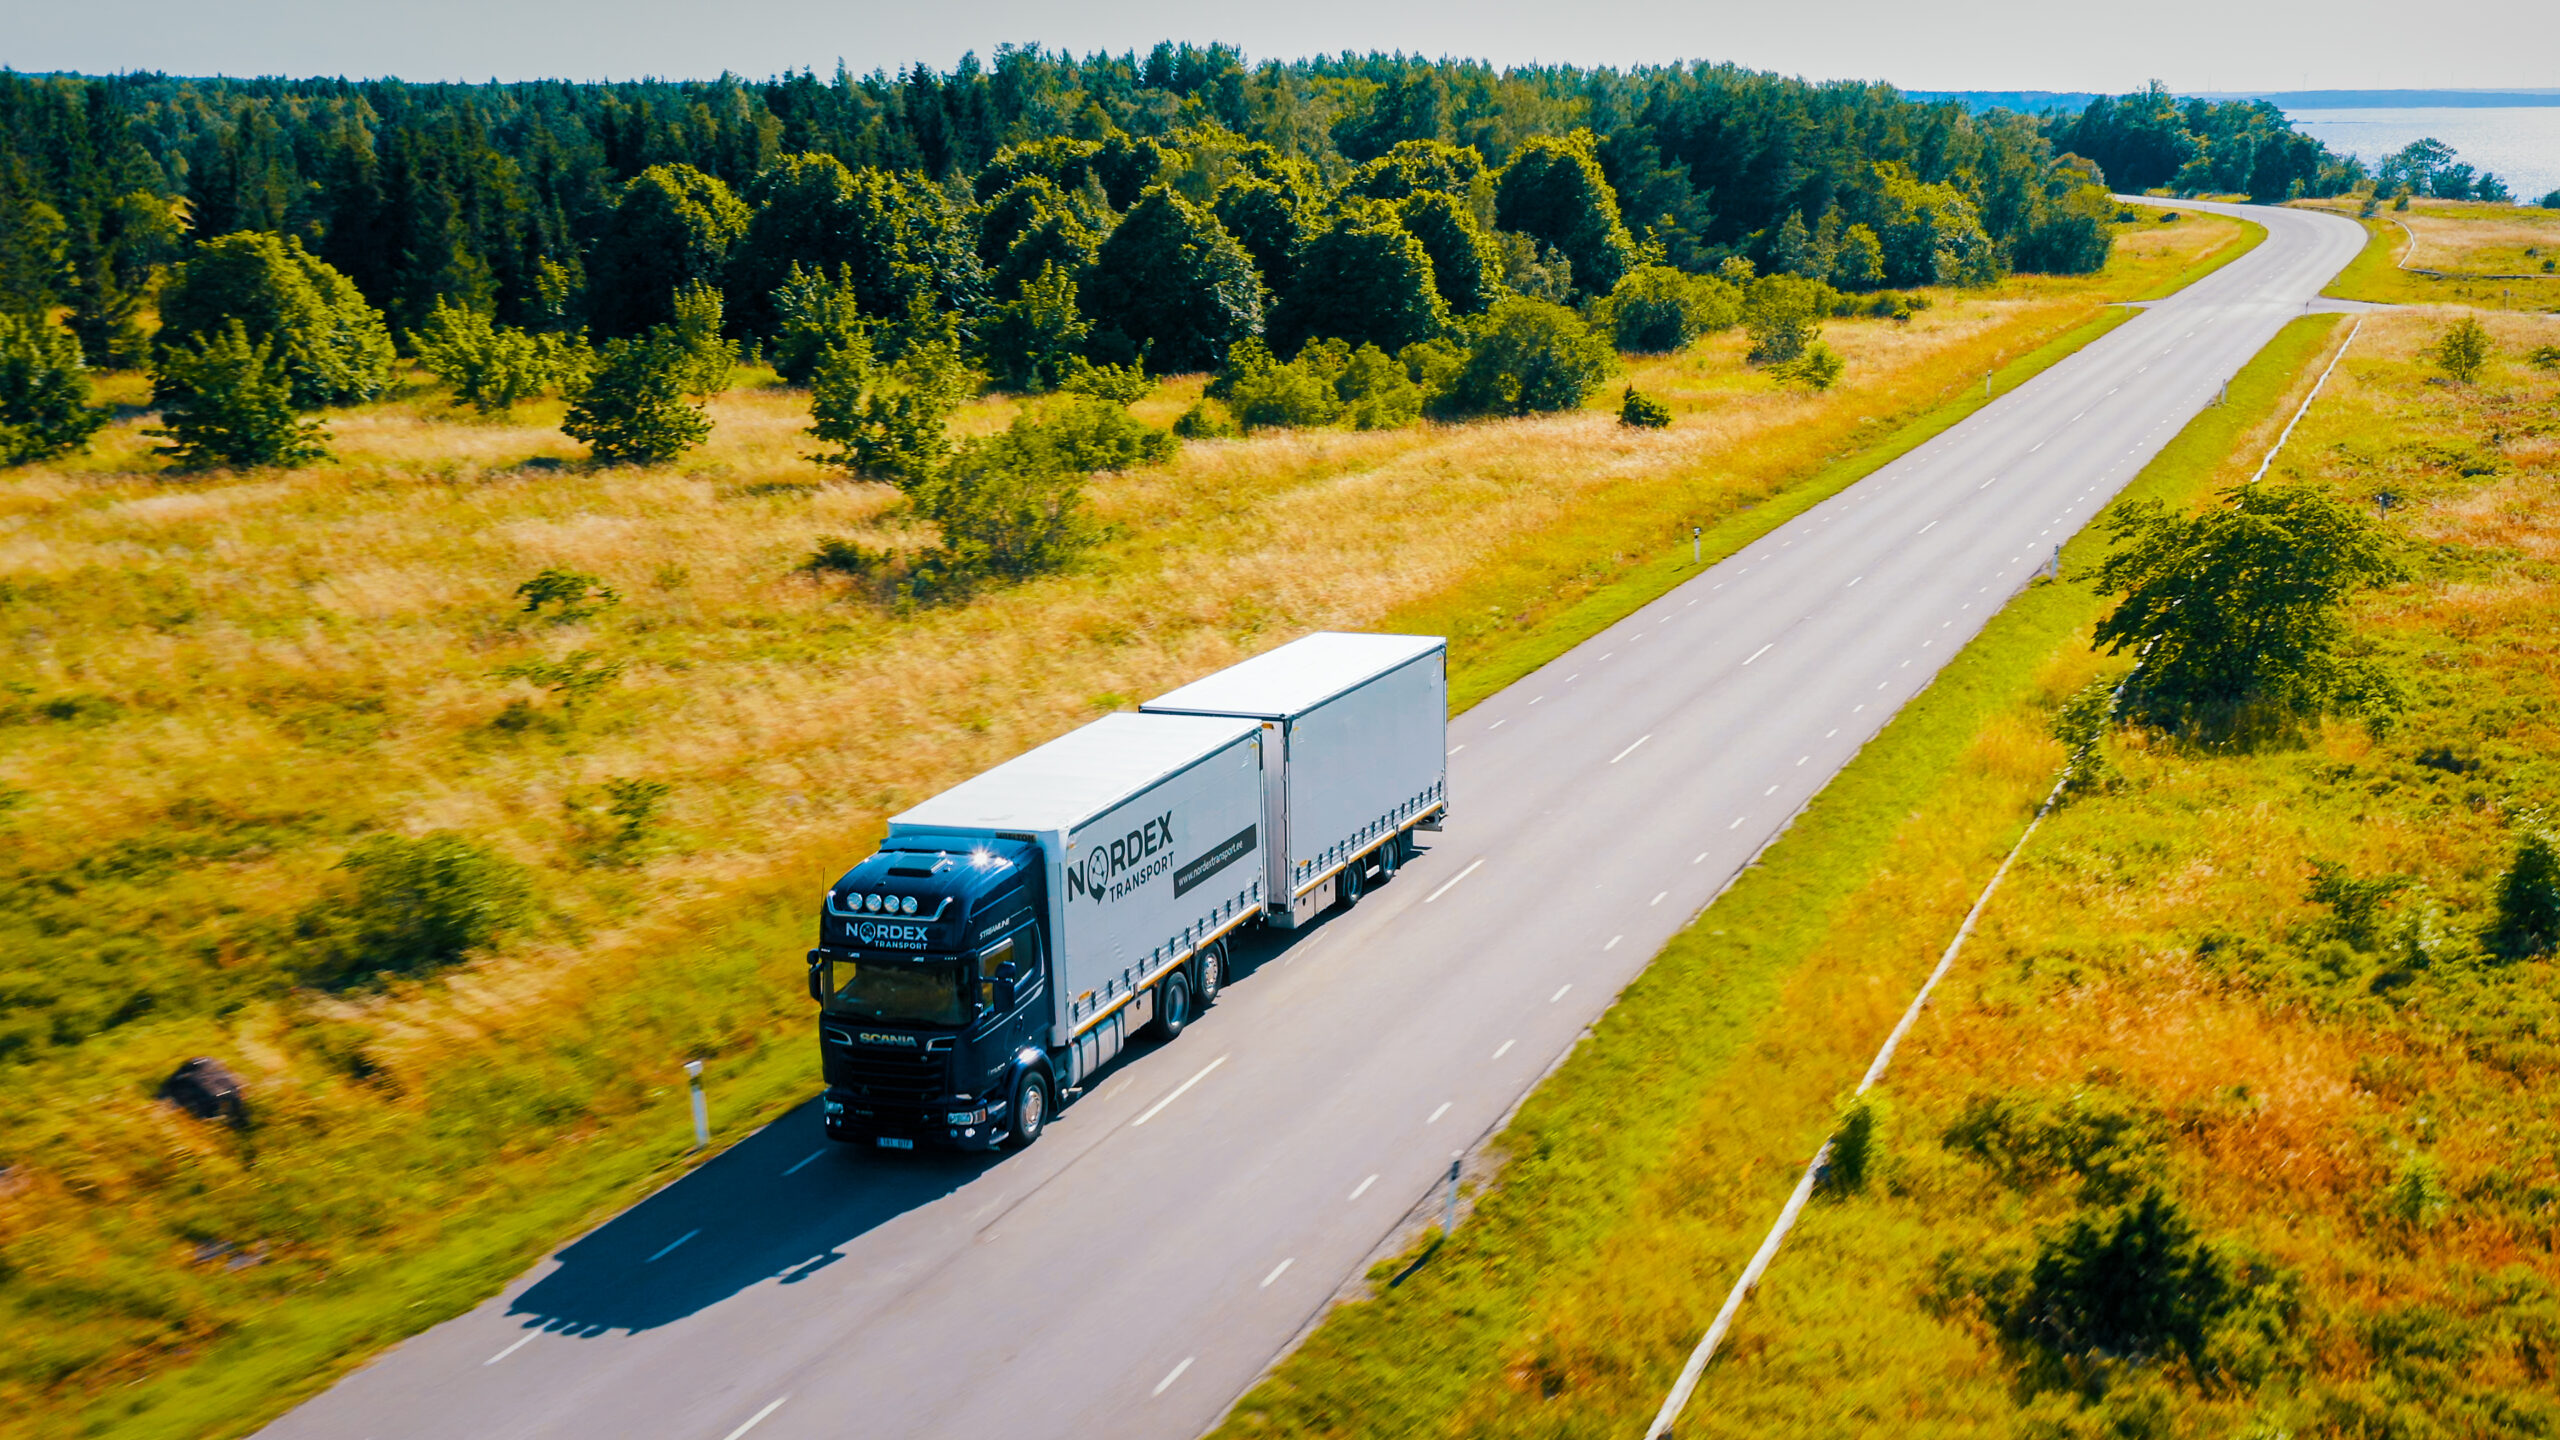 Nordex-Transport-1